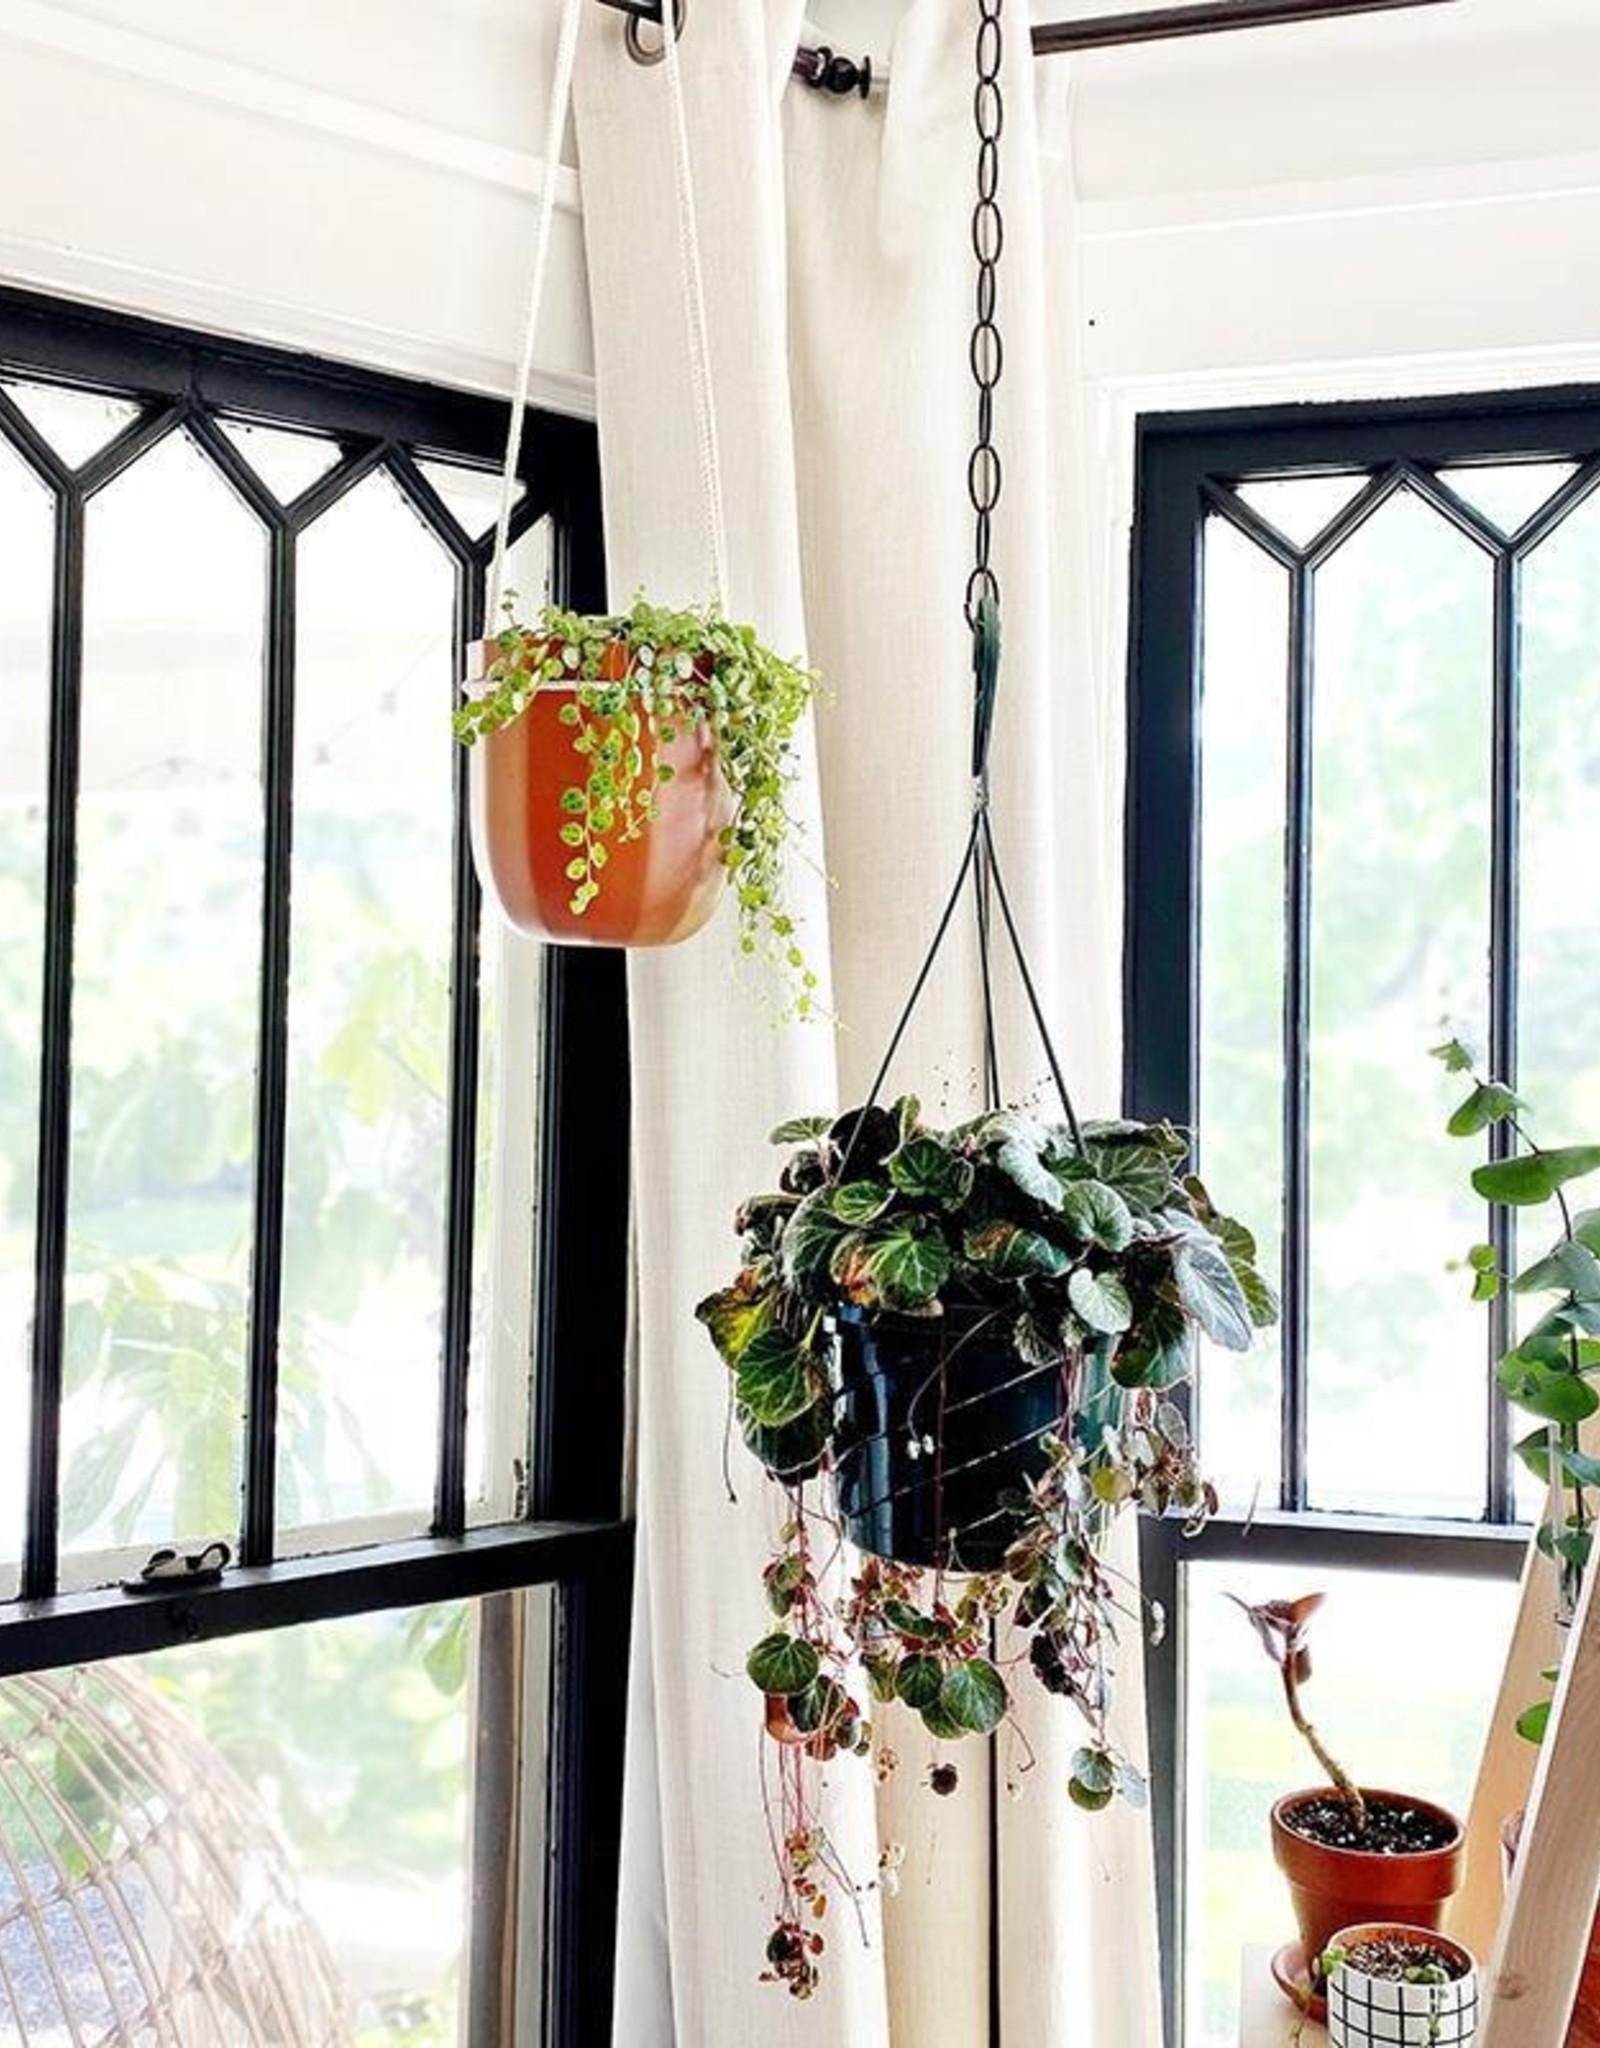 Loop Planter - Terracotta